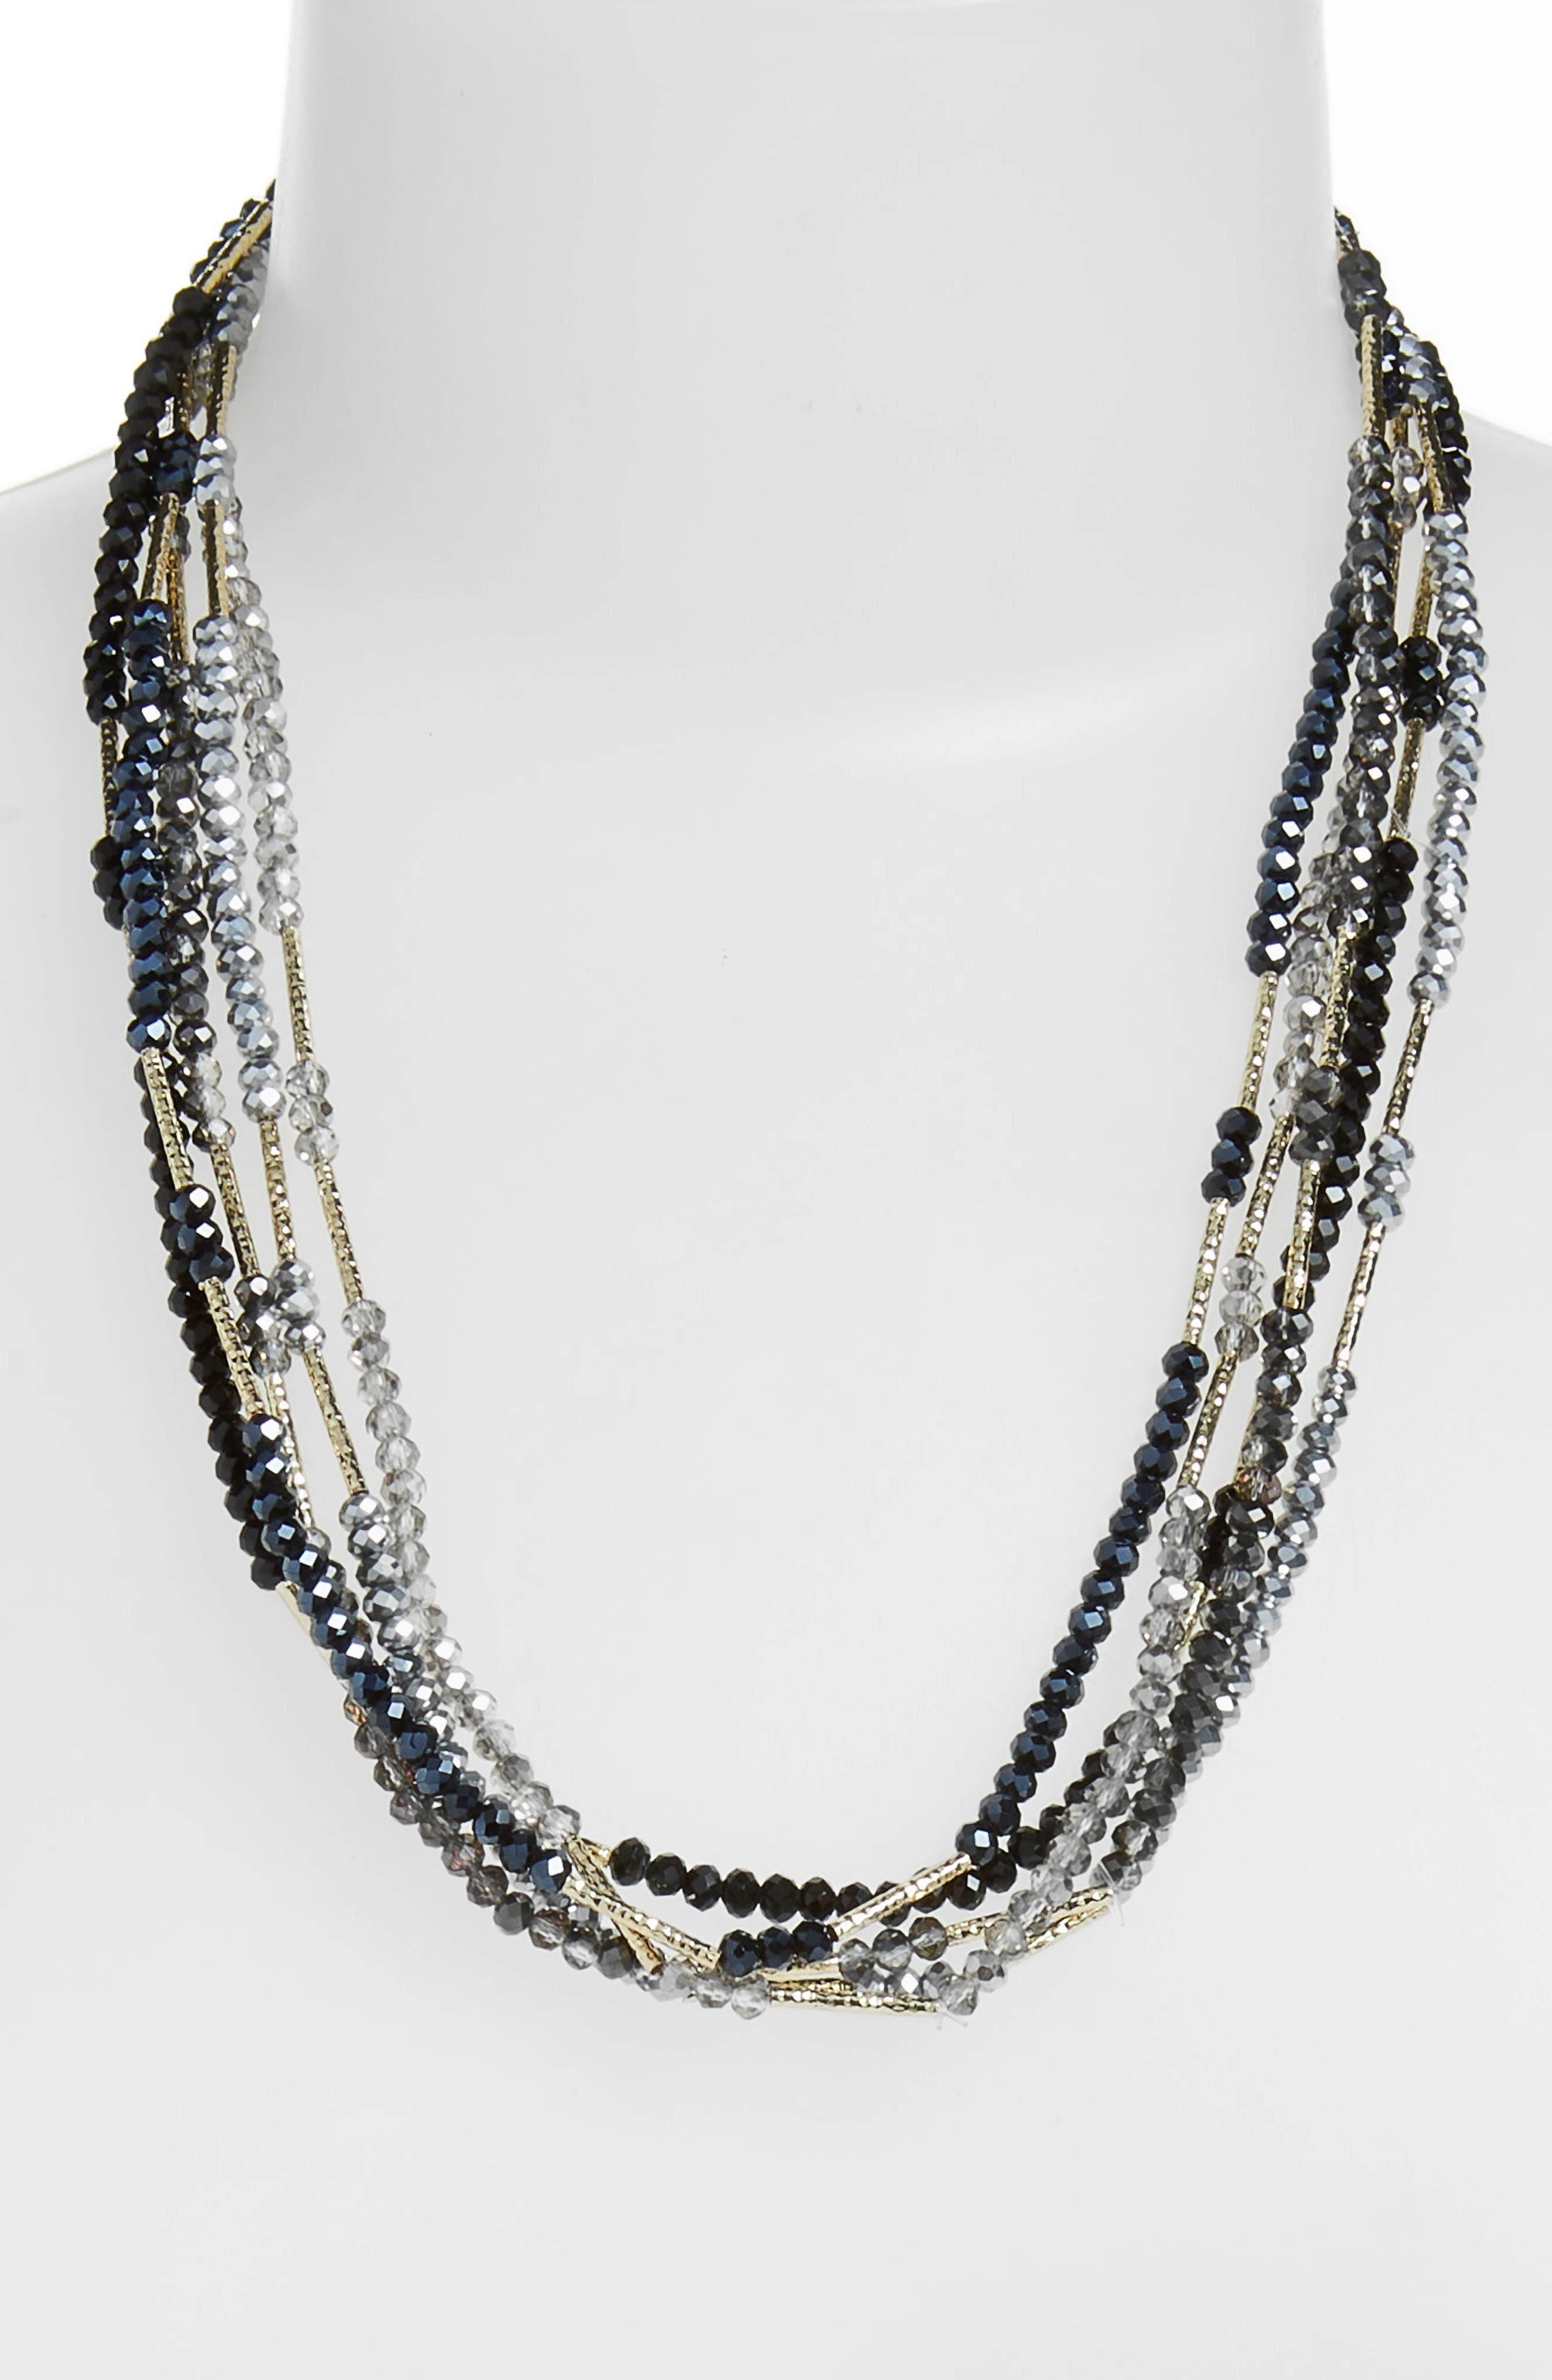 STELLA + RUBY Multi Strand Necklace in Gold/ Black